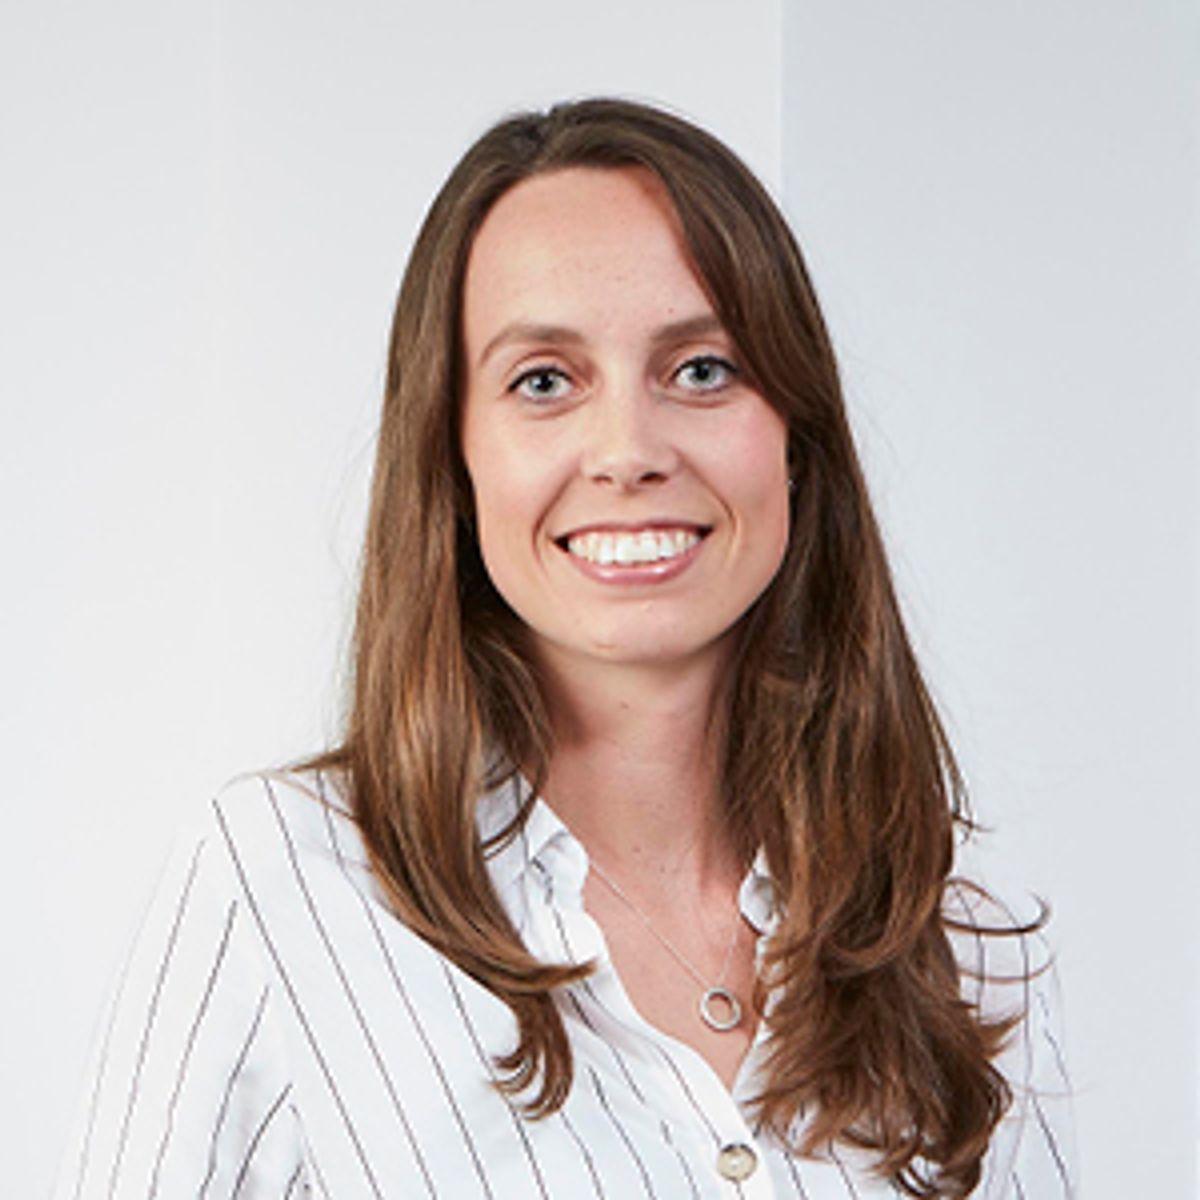 Sophie Welbourn